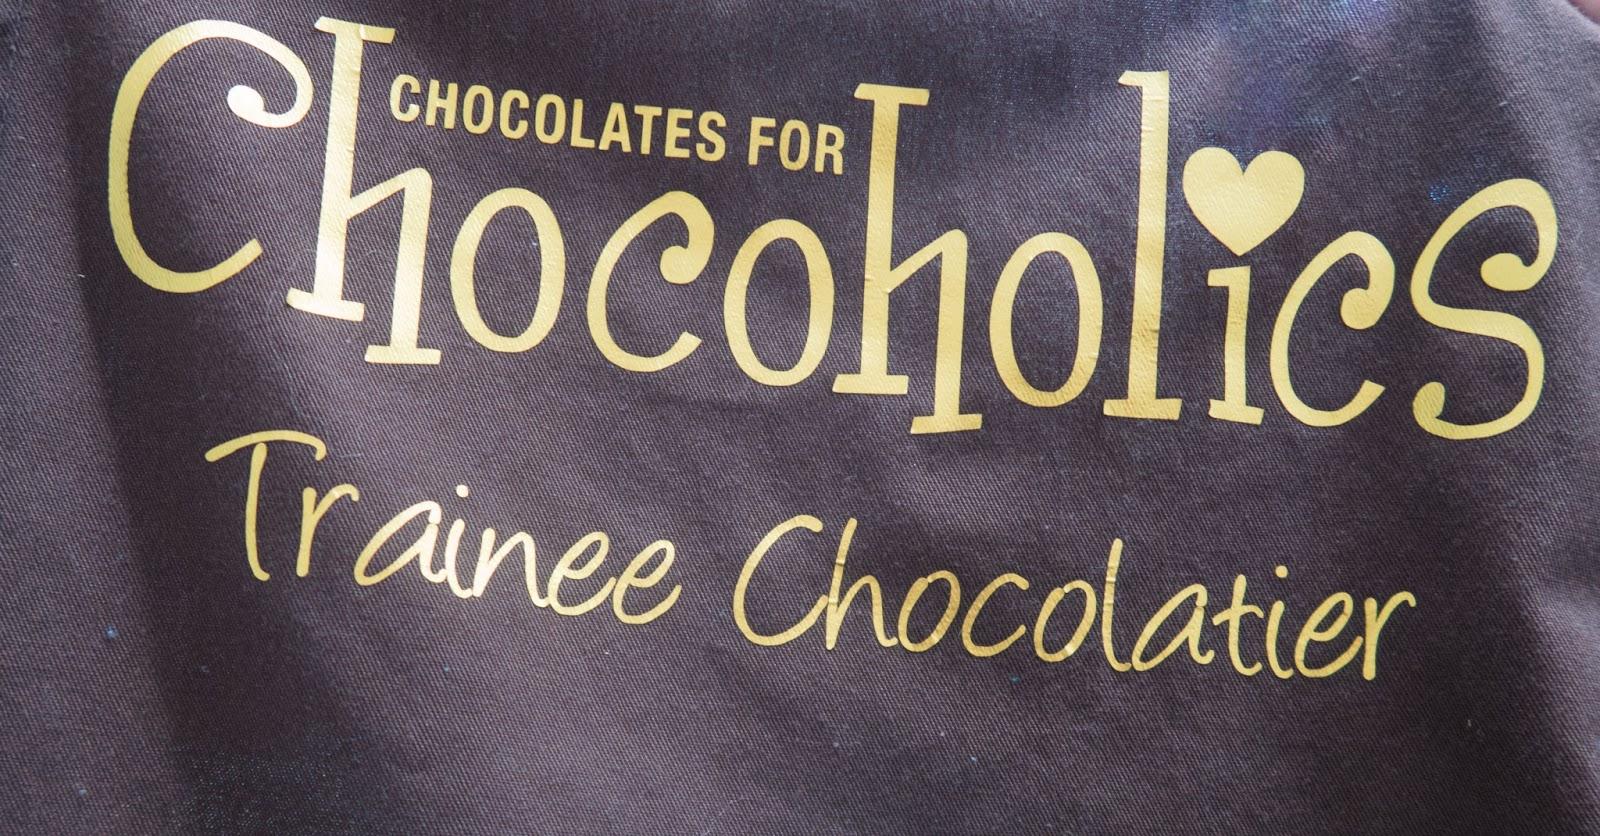 Ramblings Of A Jaffa Cat Chocolates For Chocoholics Workshop